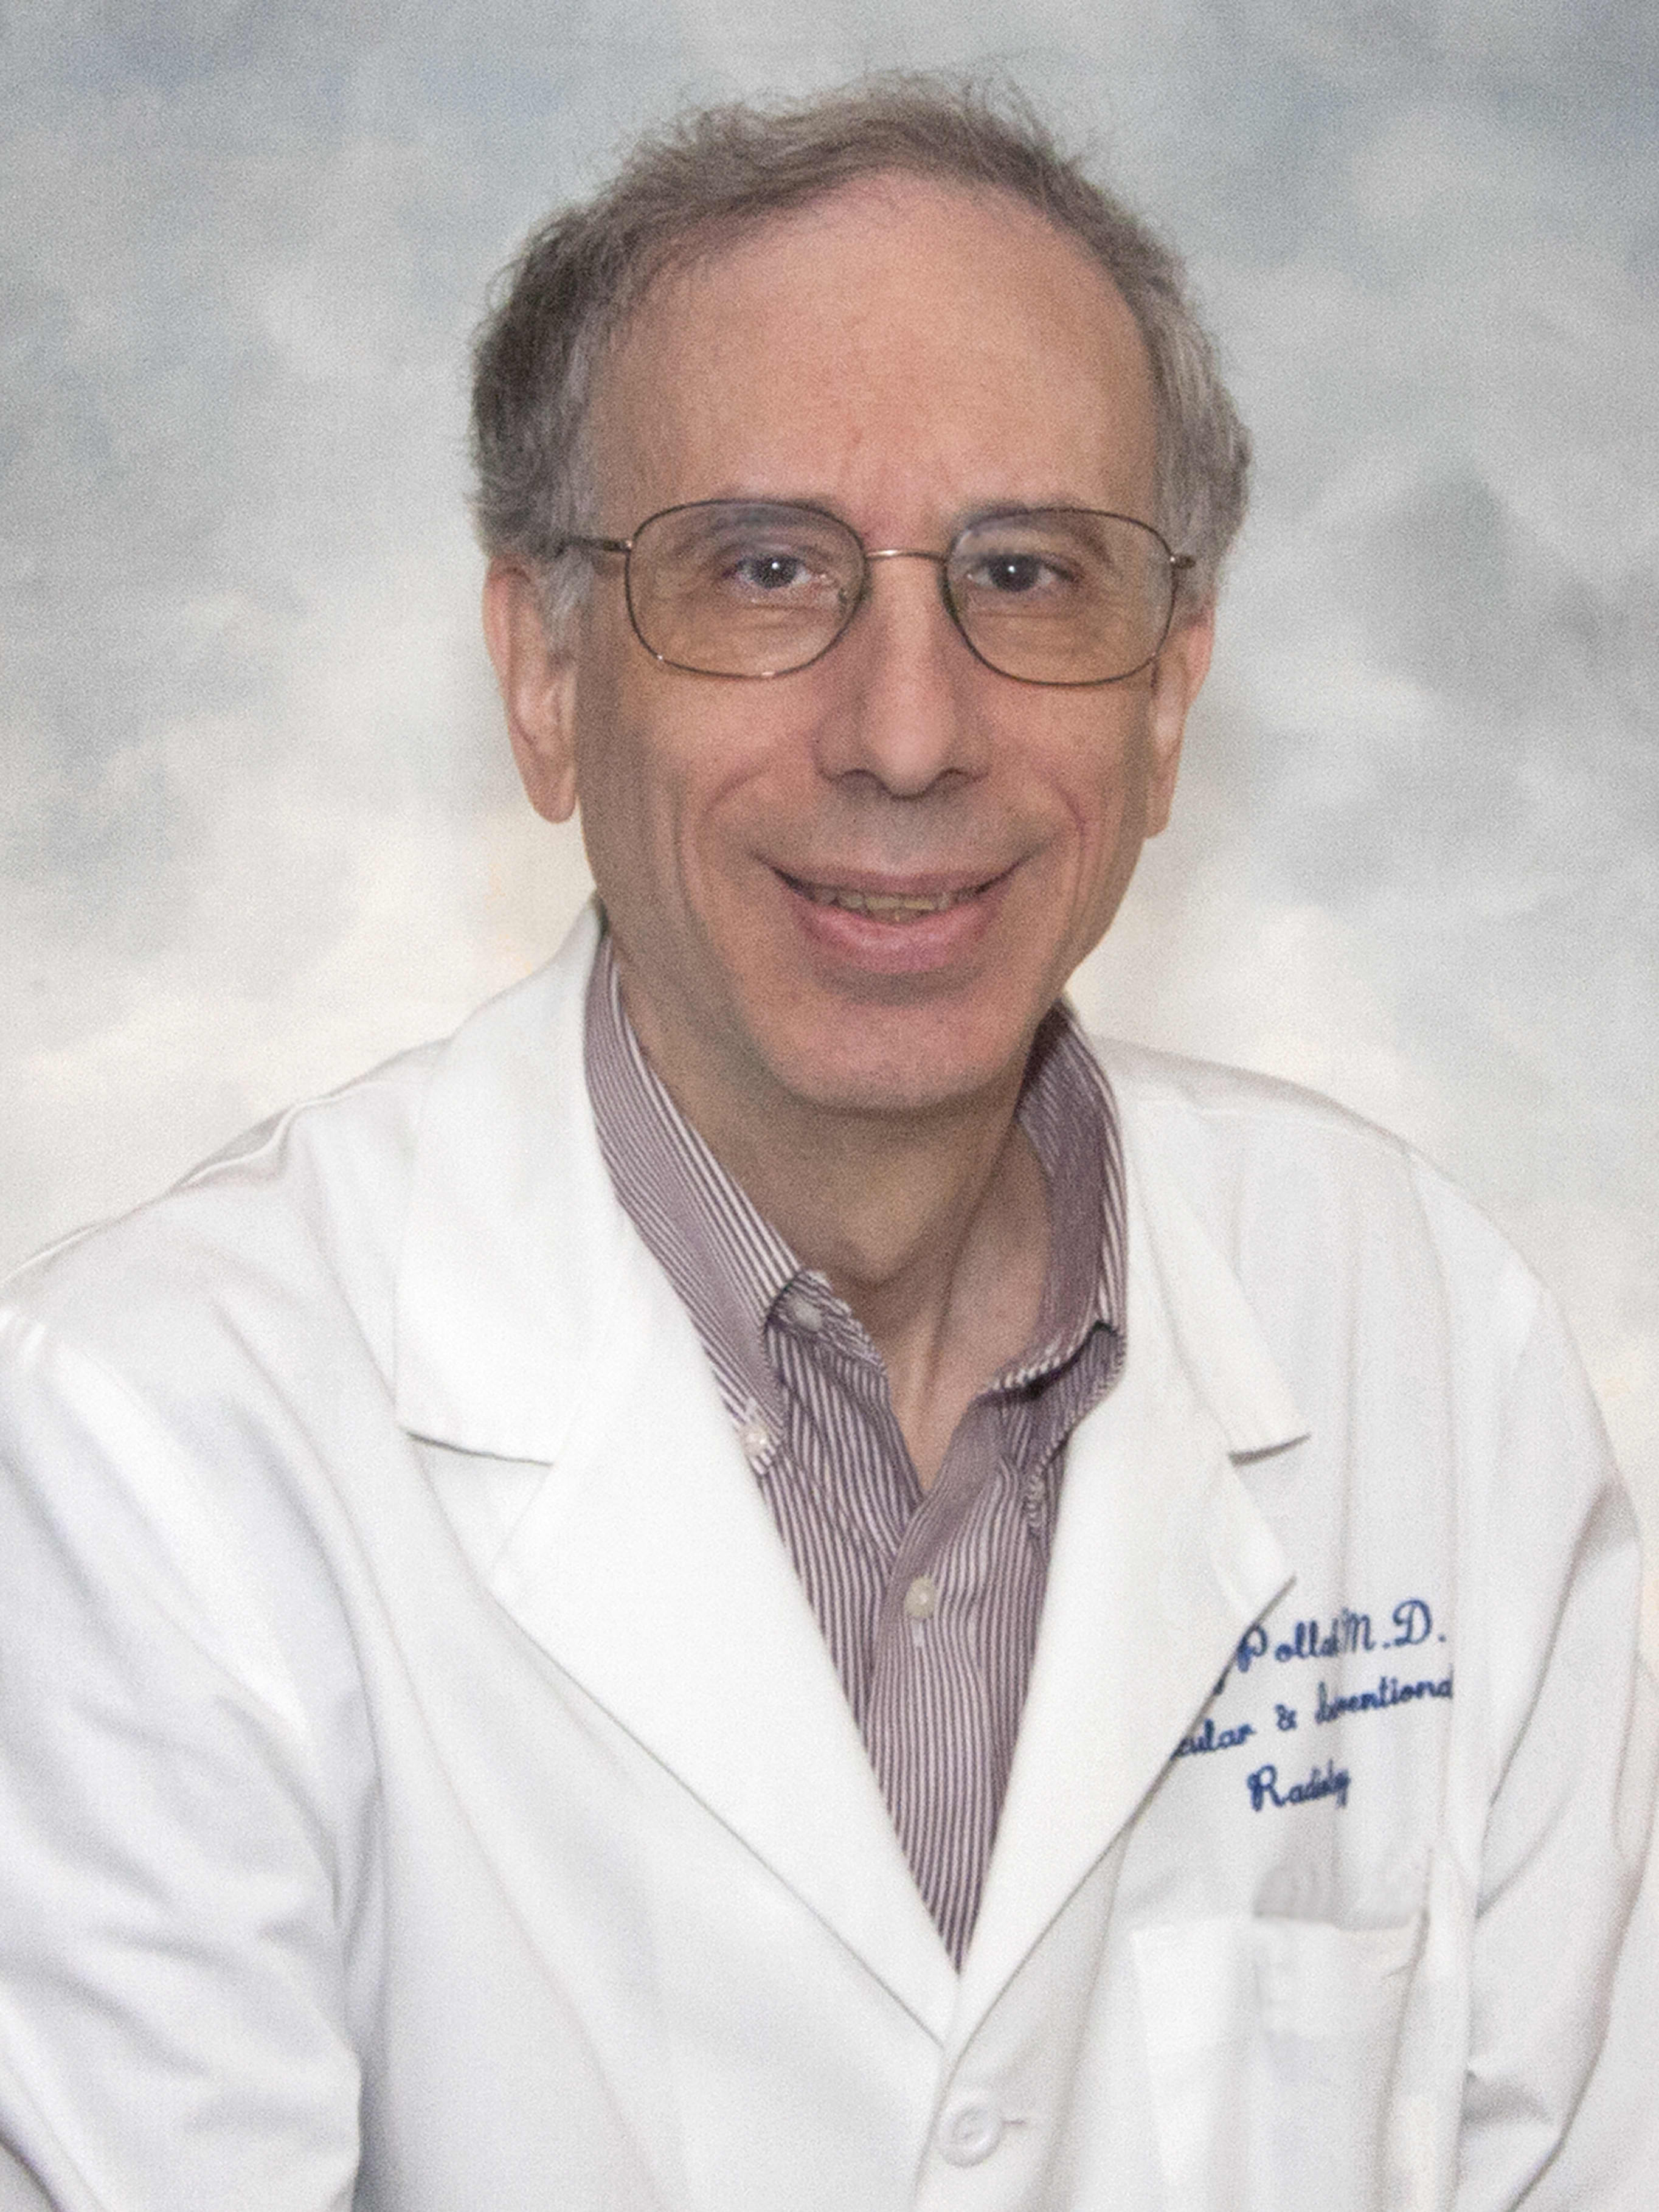 Jeffrey Pollak